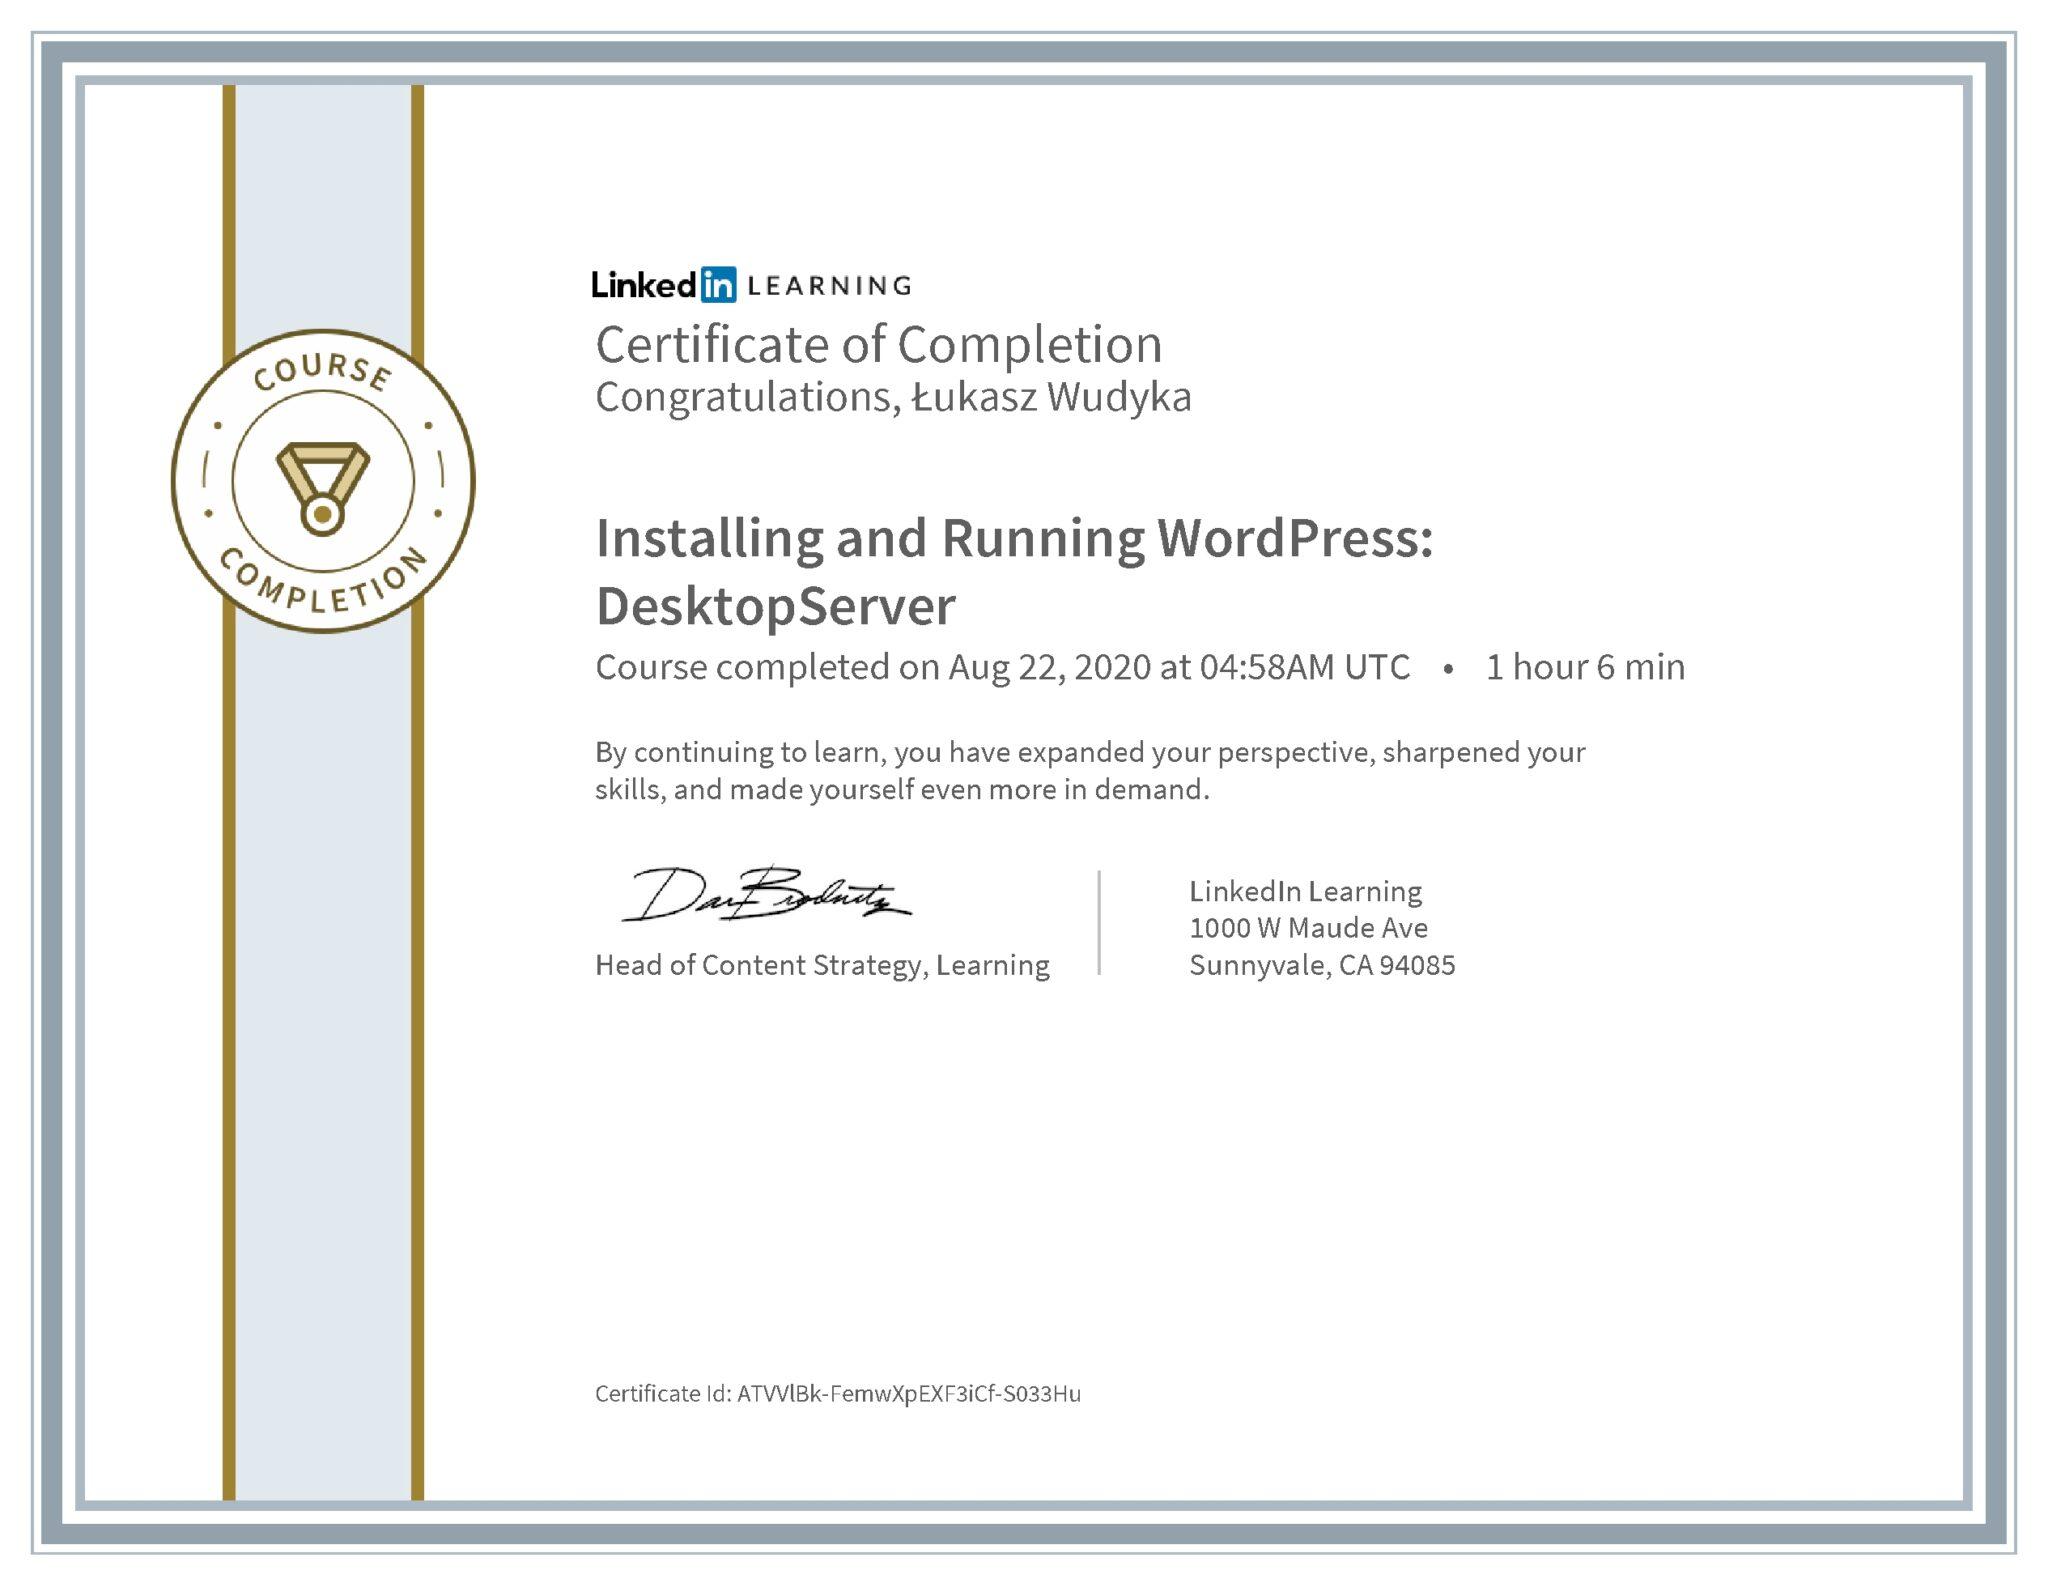 Łukasz Wudyka certyfikat LinkedIn Installing and Running WordPress: DesktopServer